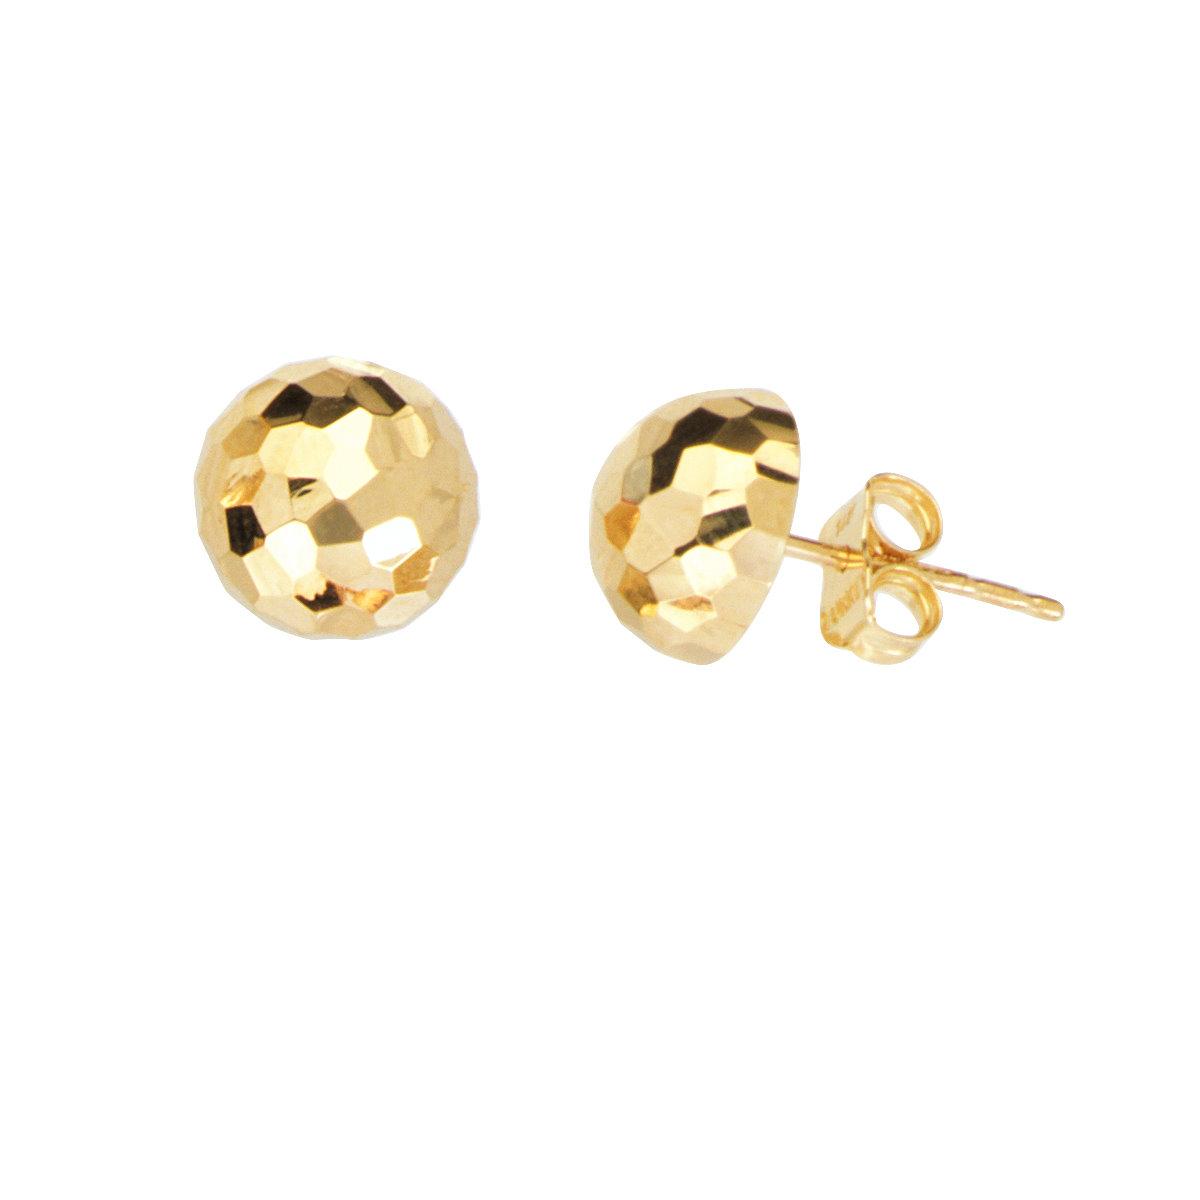 e10466b12 14k Yellow Gold Half Ball Stud Earrings Mirror Disco Diamond-cut Texture